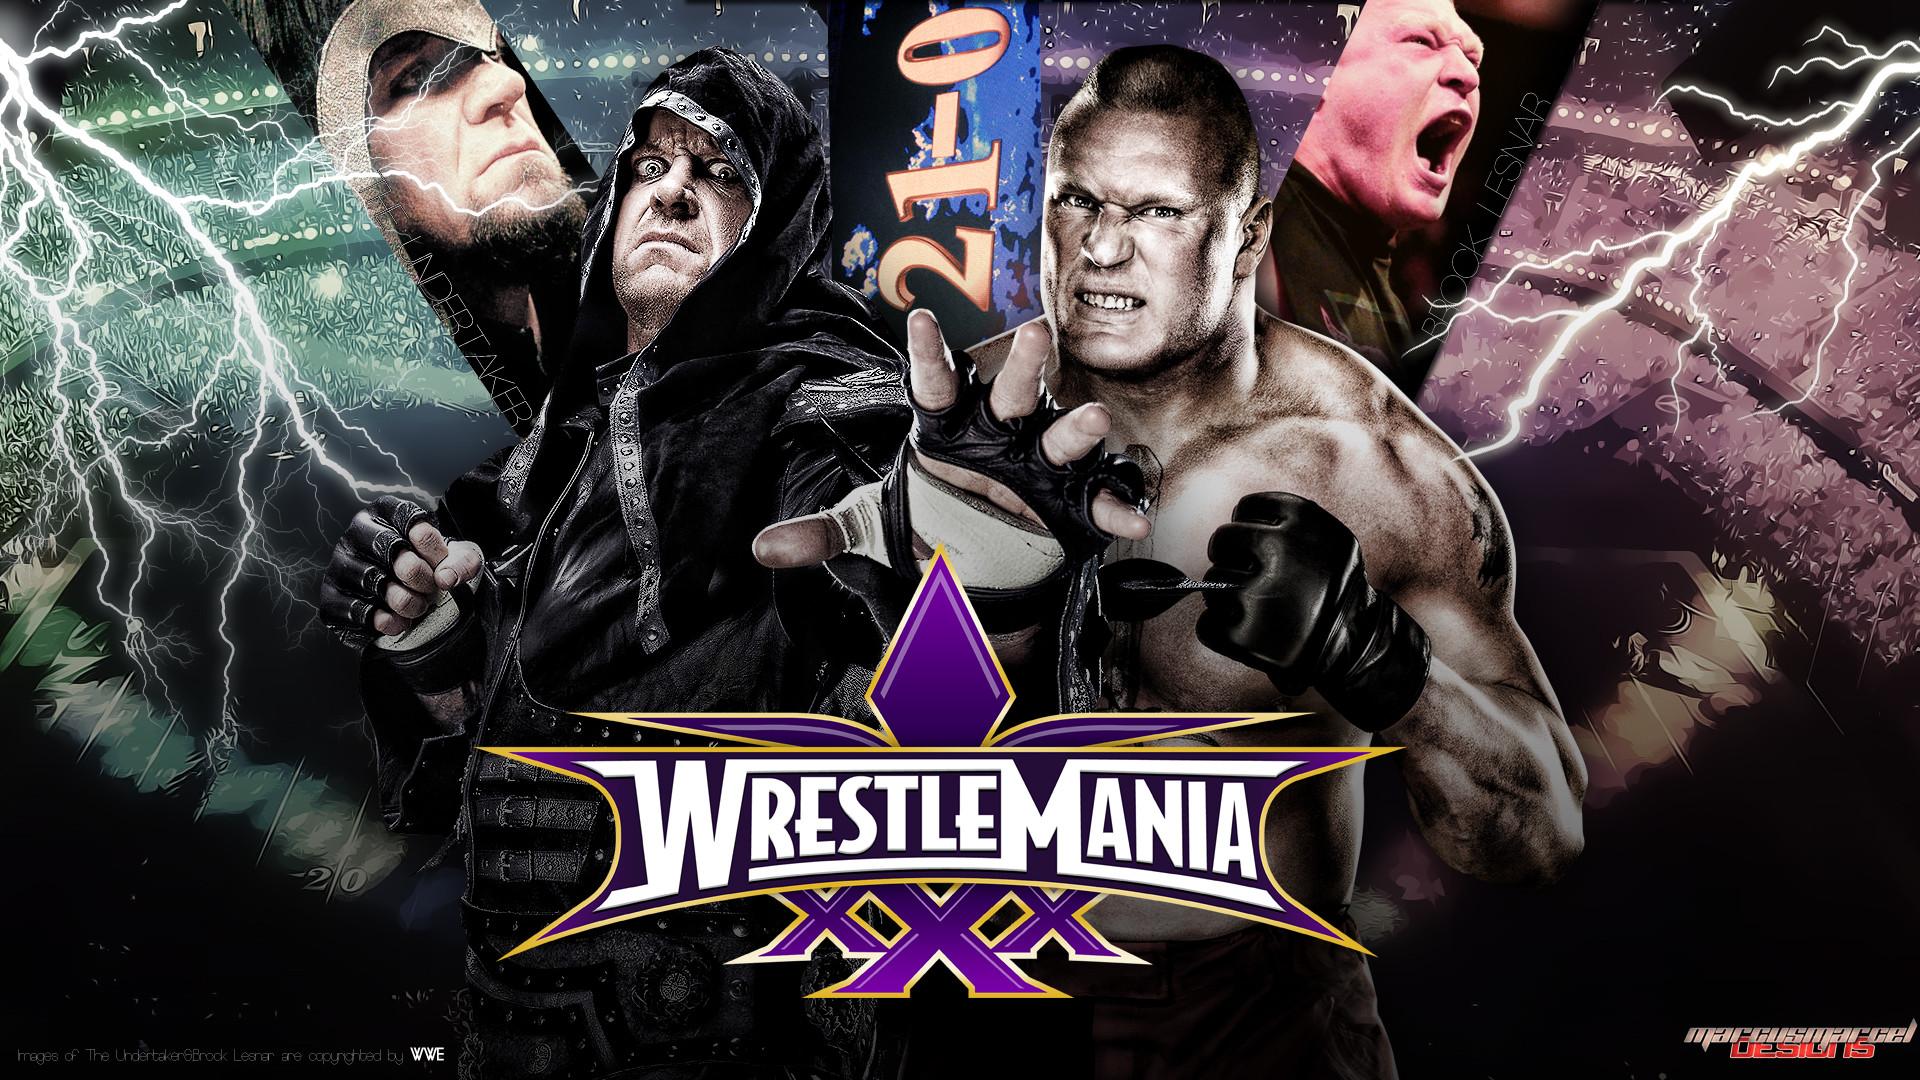 … WrestleMania XXX – Undertaker vs Brock Lesnar by MarcusMarcel